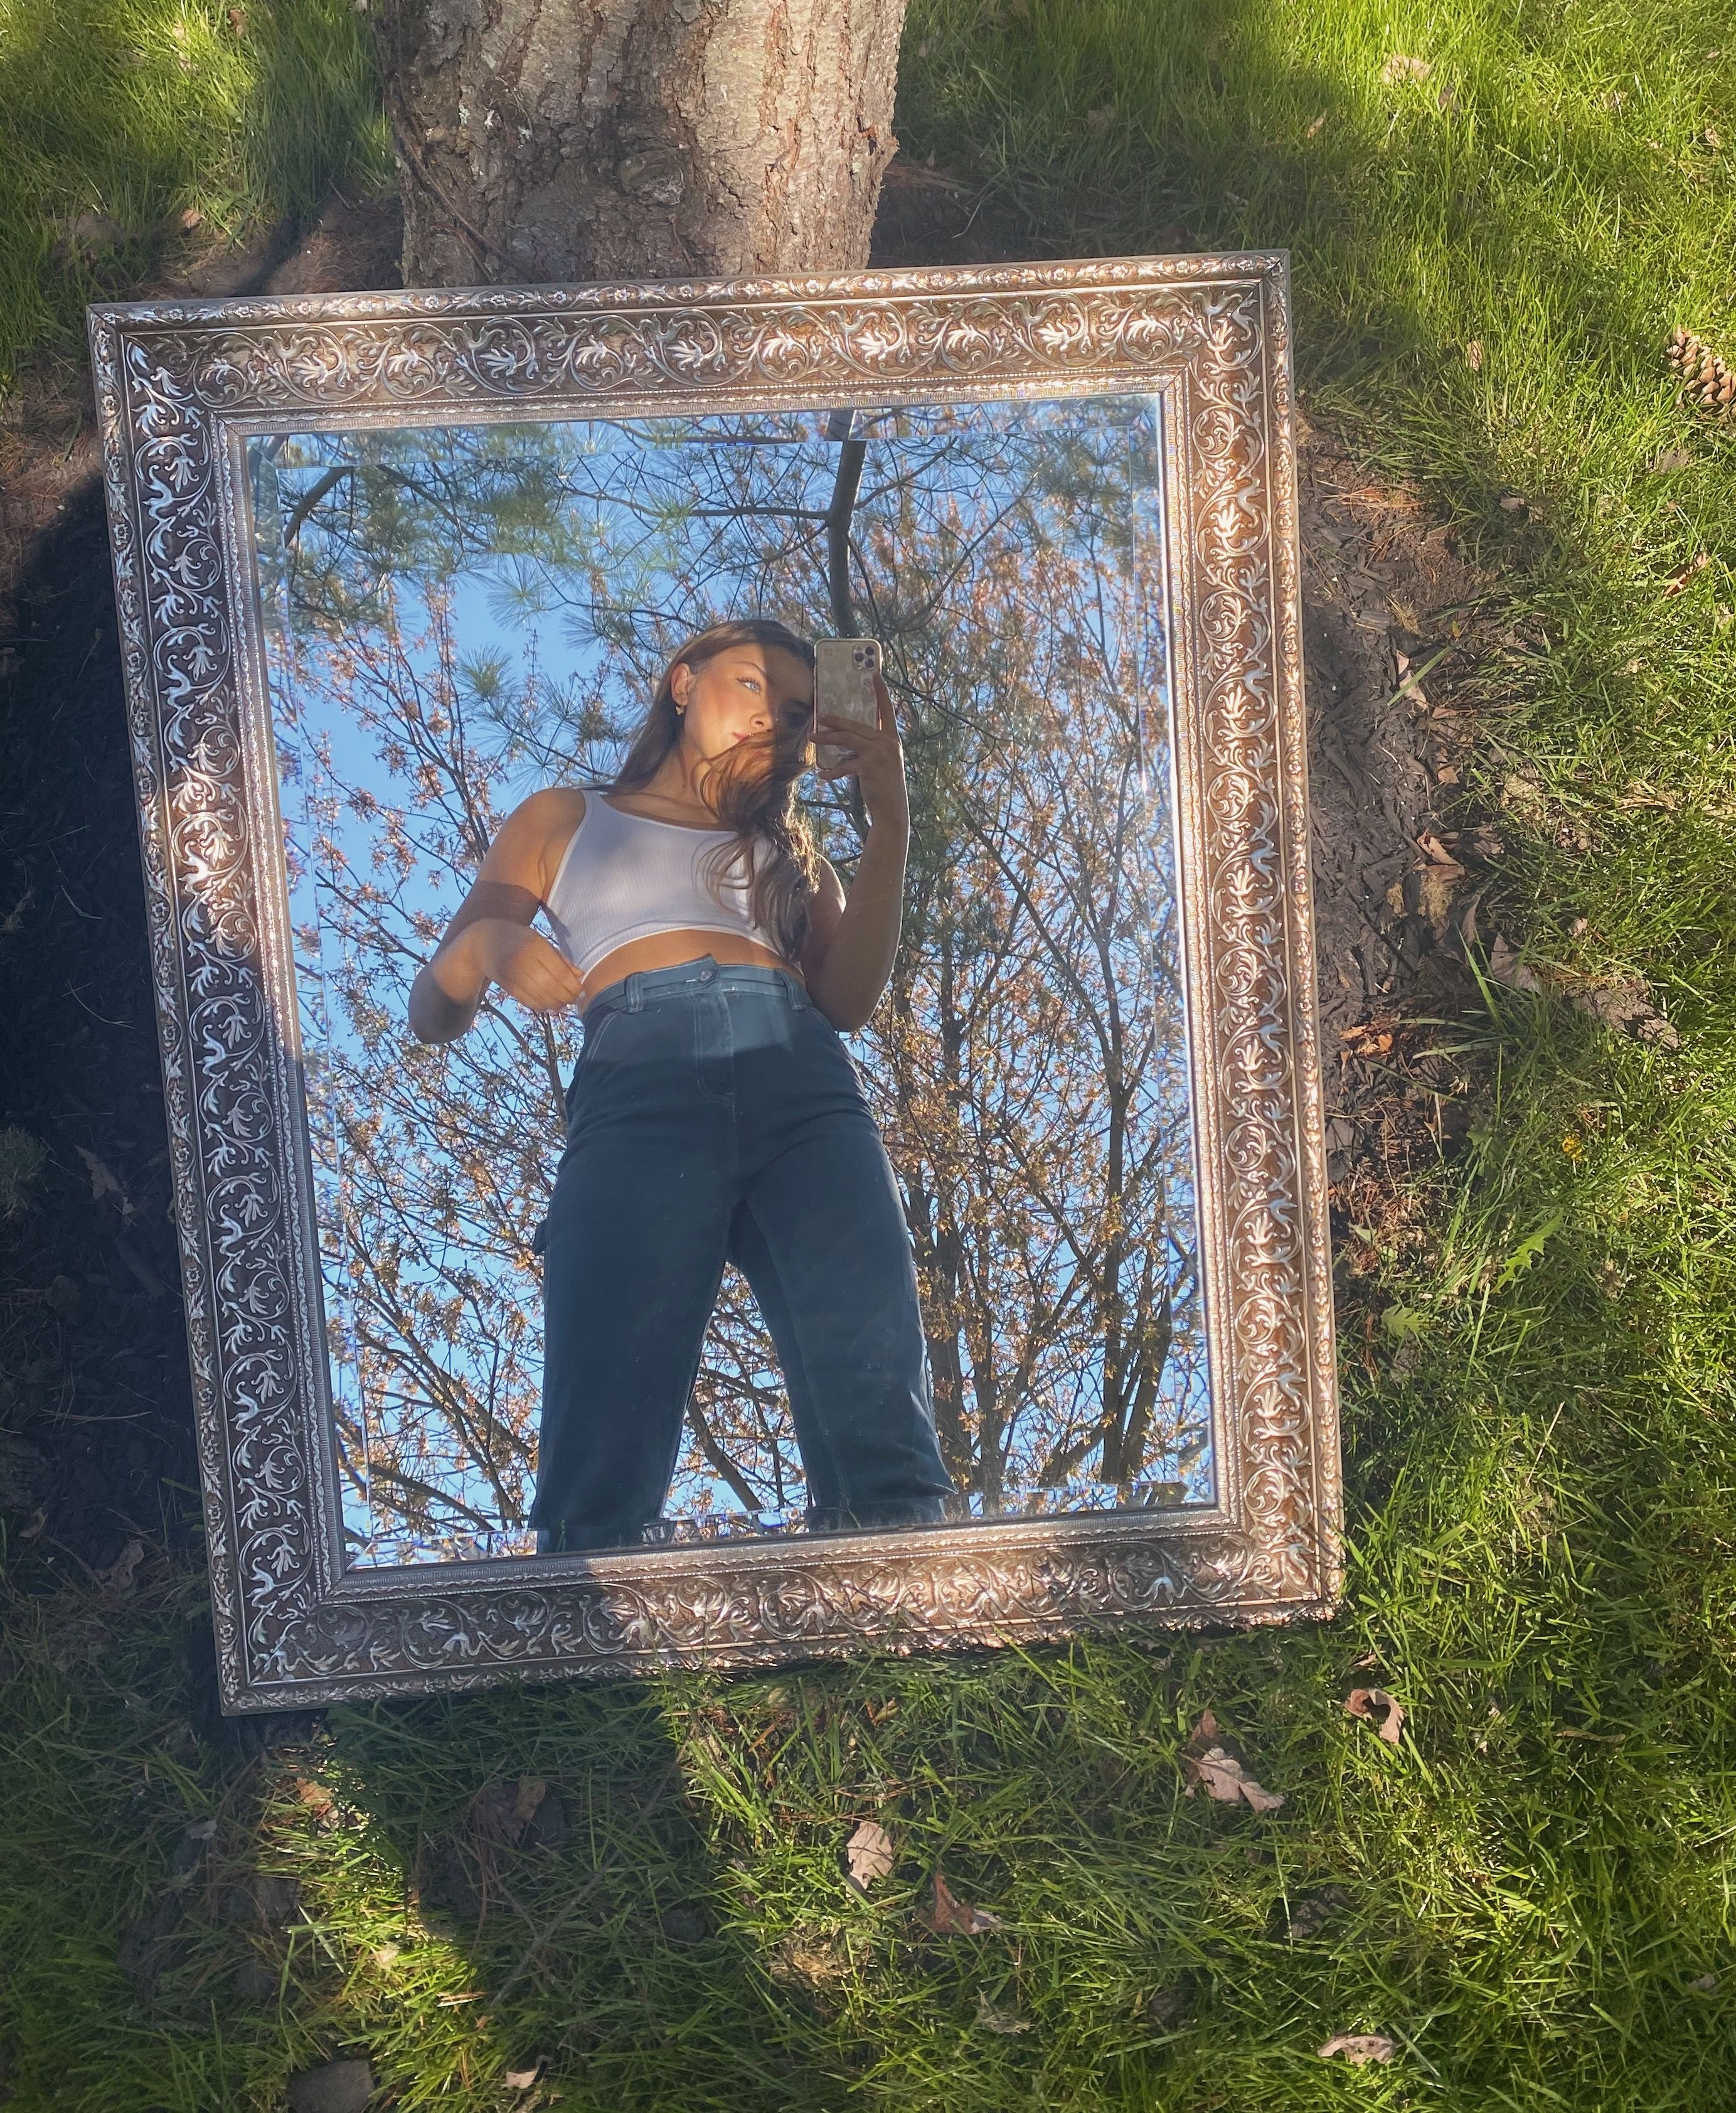 Outdoor Mirror Picture Fotografia Criativa Poses De Fotos Menina Ideias Fotografia